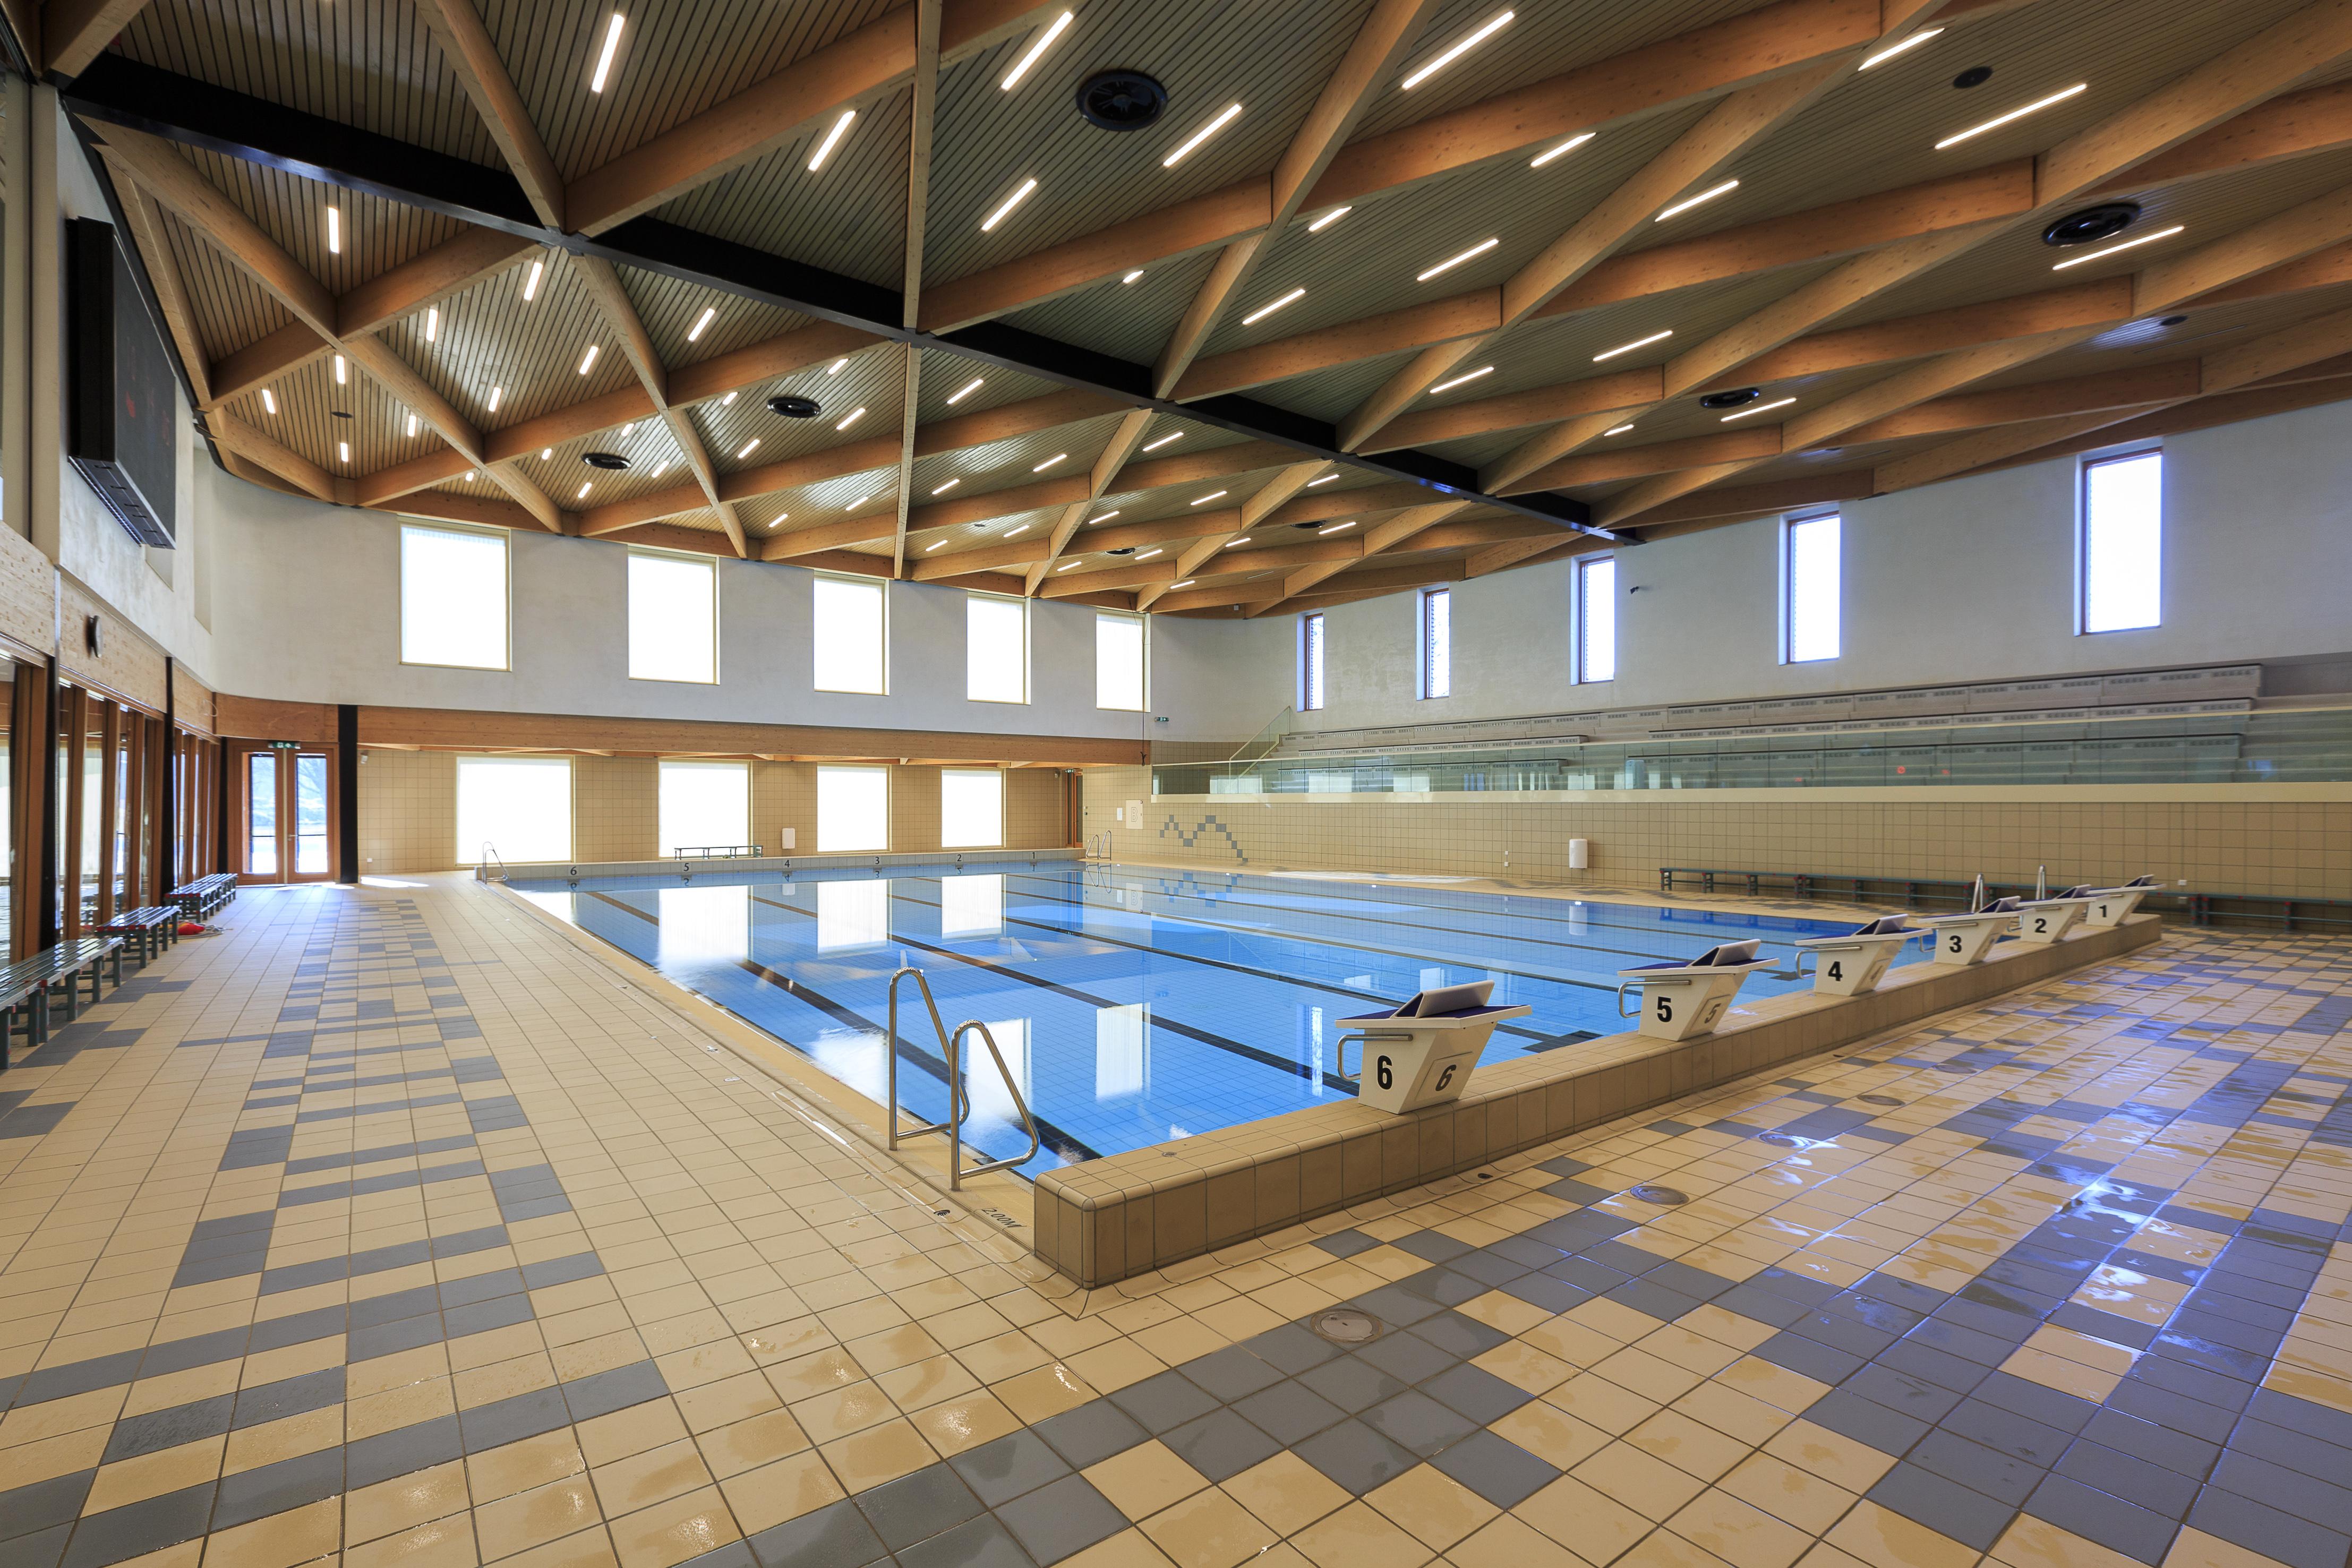 binnenbad-noorderparkbad-zwembad-manman